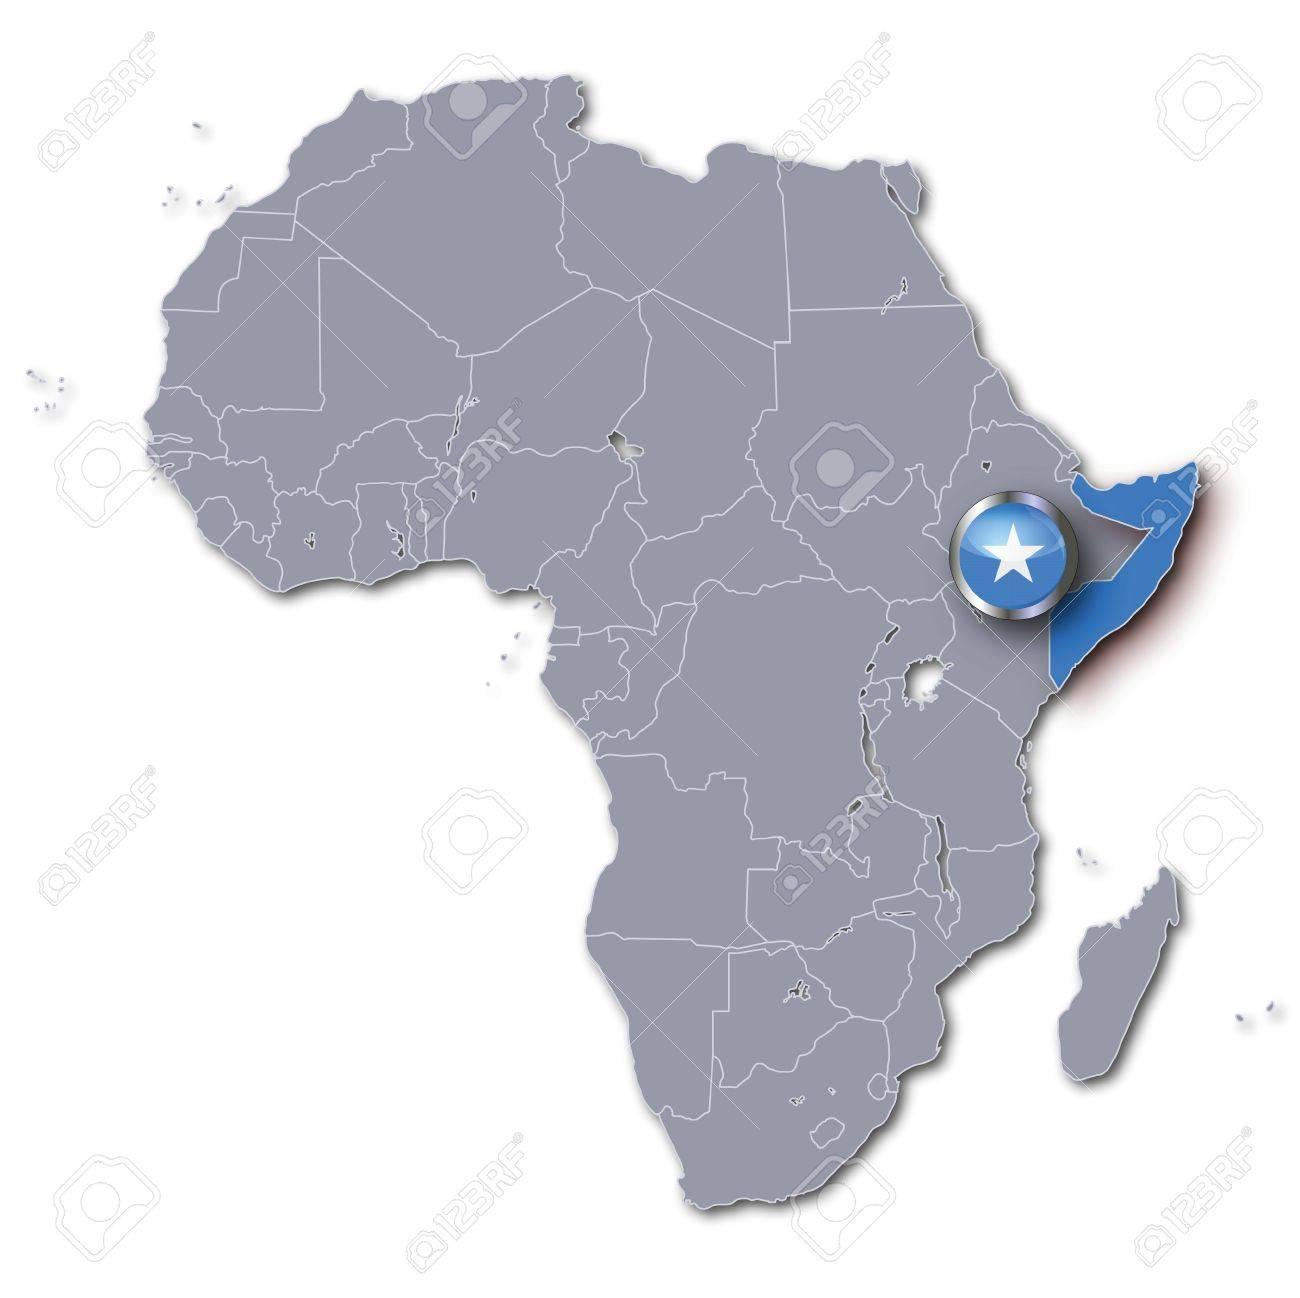 Africa map Somalia on map of senegal africa, map of rwanda africa, map of morocco africa, map of somaliland africa, map of tanzania africa, map of africa with countries, map of gabon africa, map of madagascar africa, map of zimbabwe africa, map of kenya africa, map of ghana africa, map of nigeria africa, map of south sudan africa, map of mauritius africa, physical map of africa, map of eritrea africa, map of mali africa, map of ethiopia africa, mogadishu africa, map of central african republic africa,